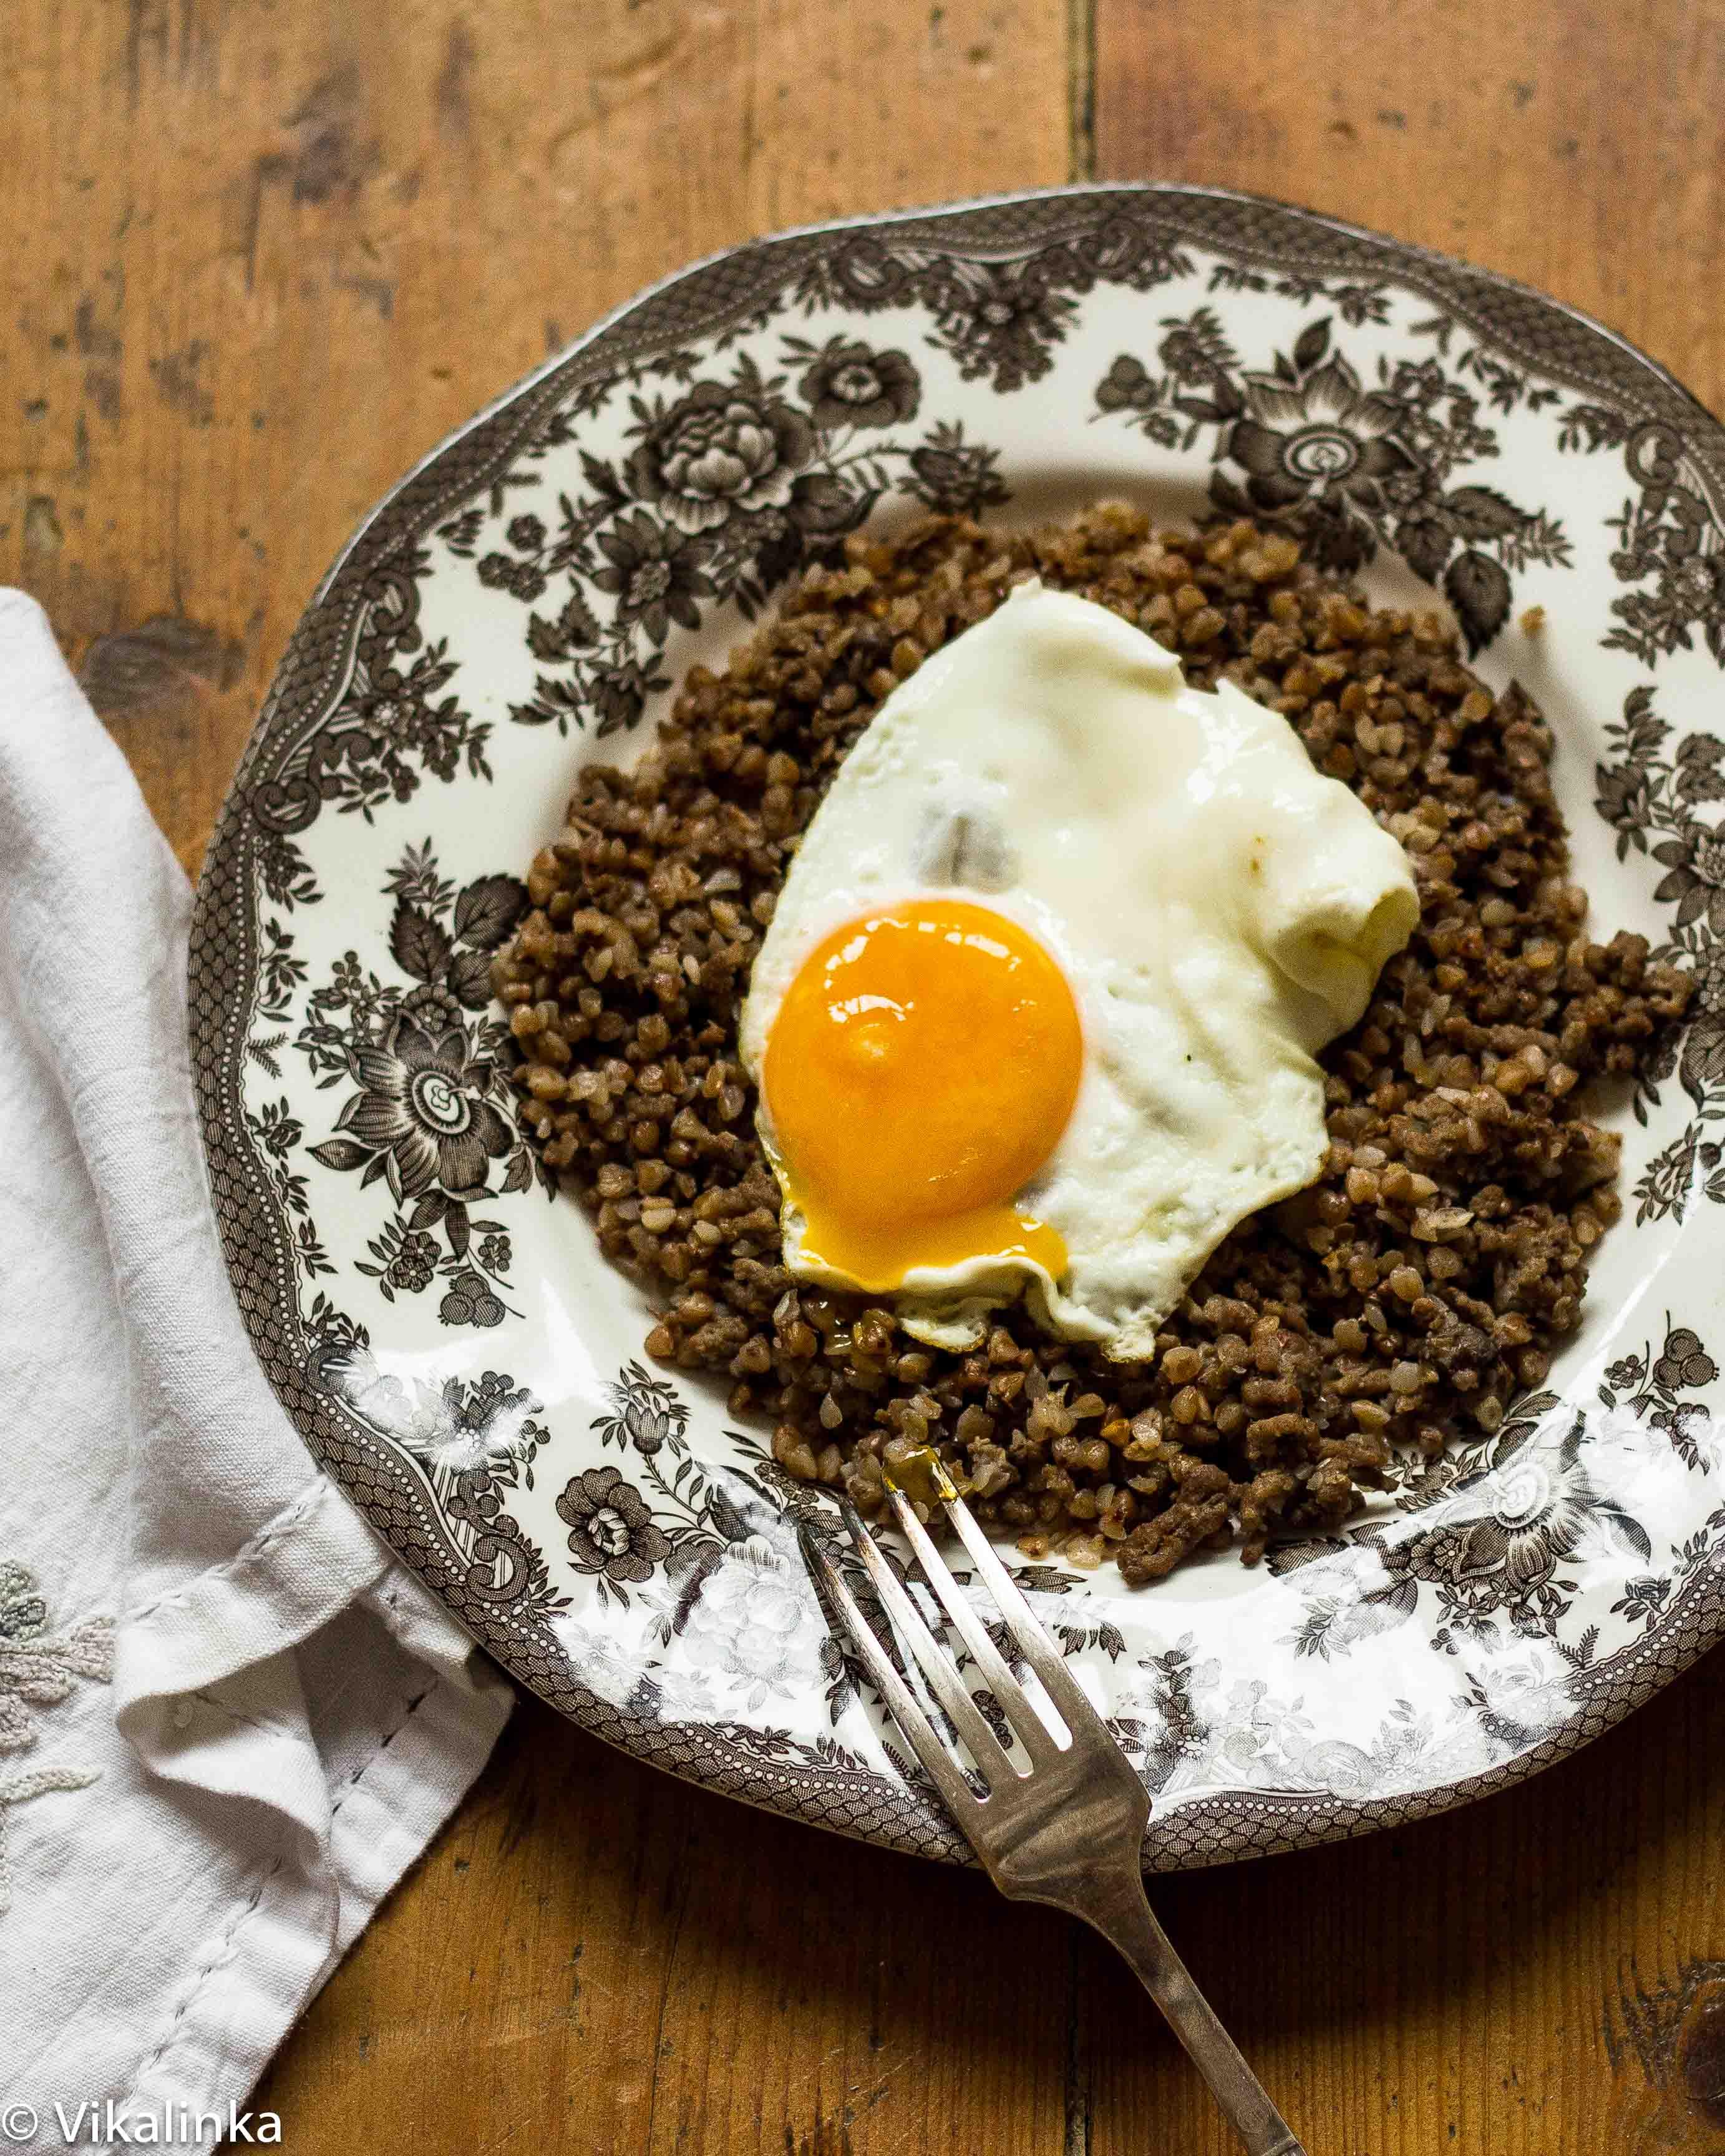 Buckwheat with caramelised onion, mushrooms and egg